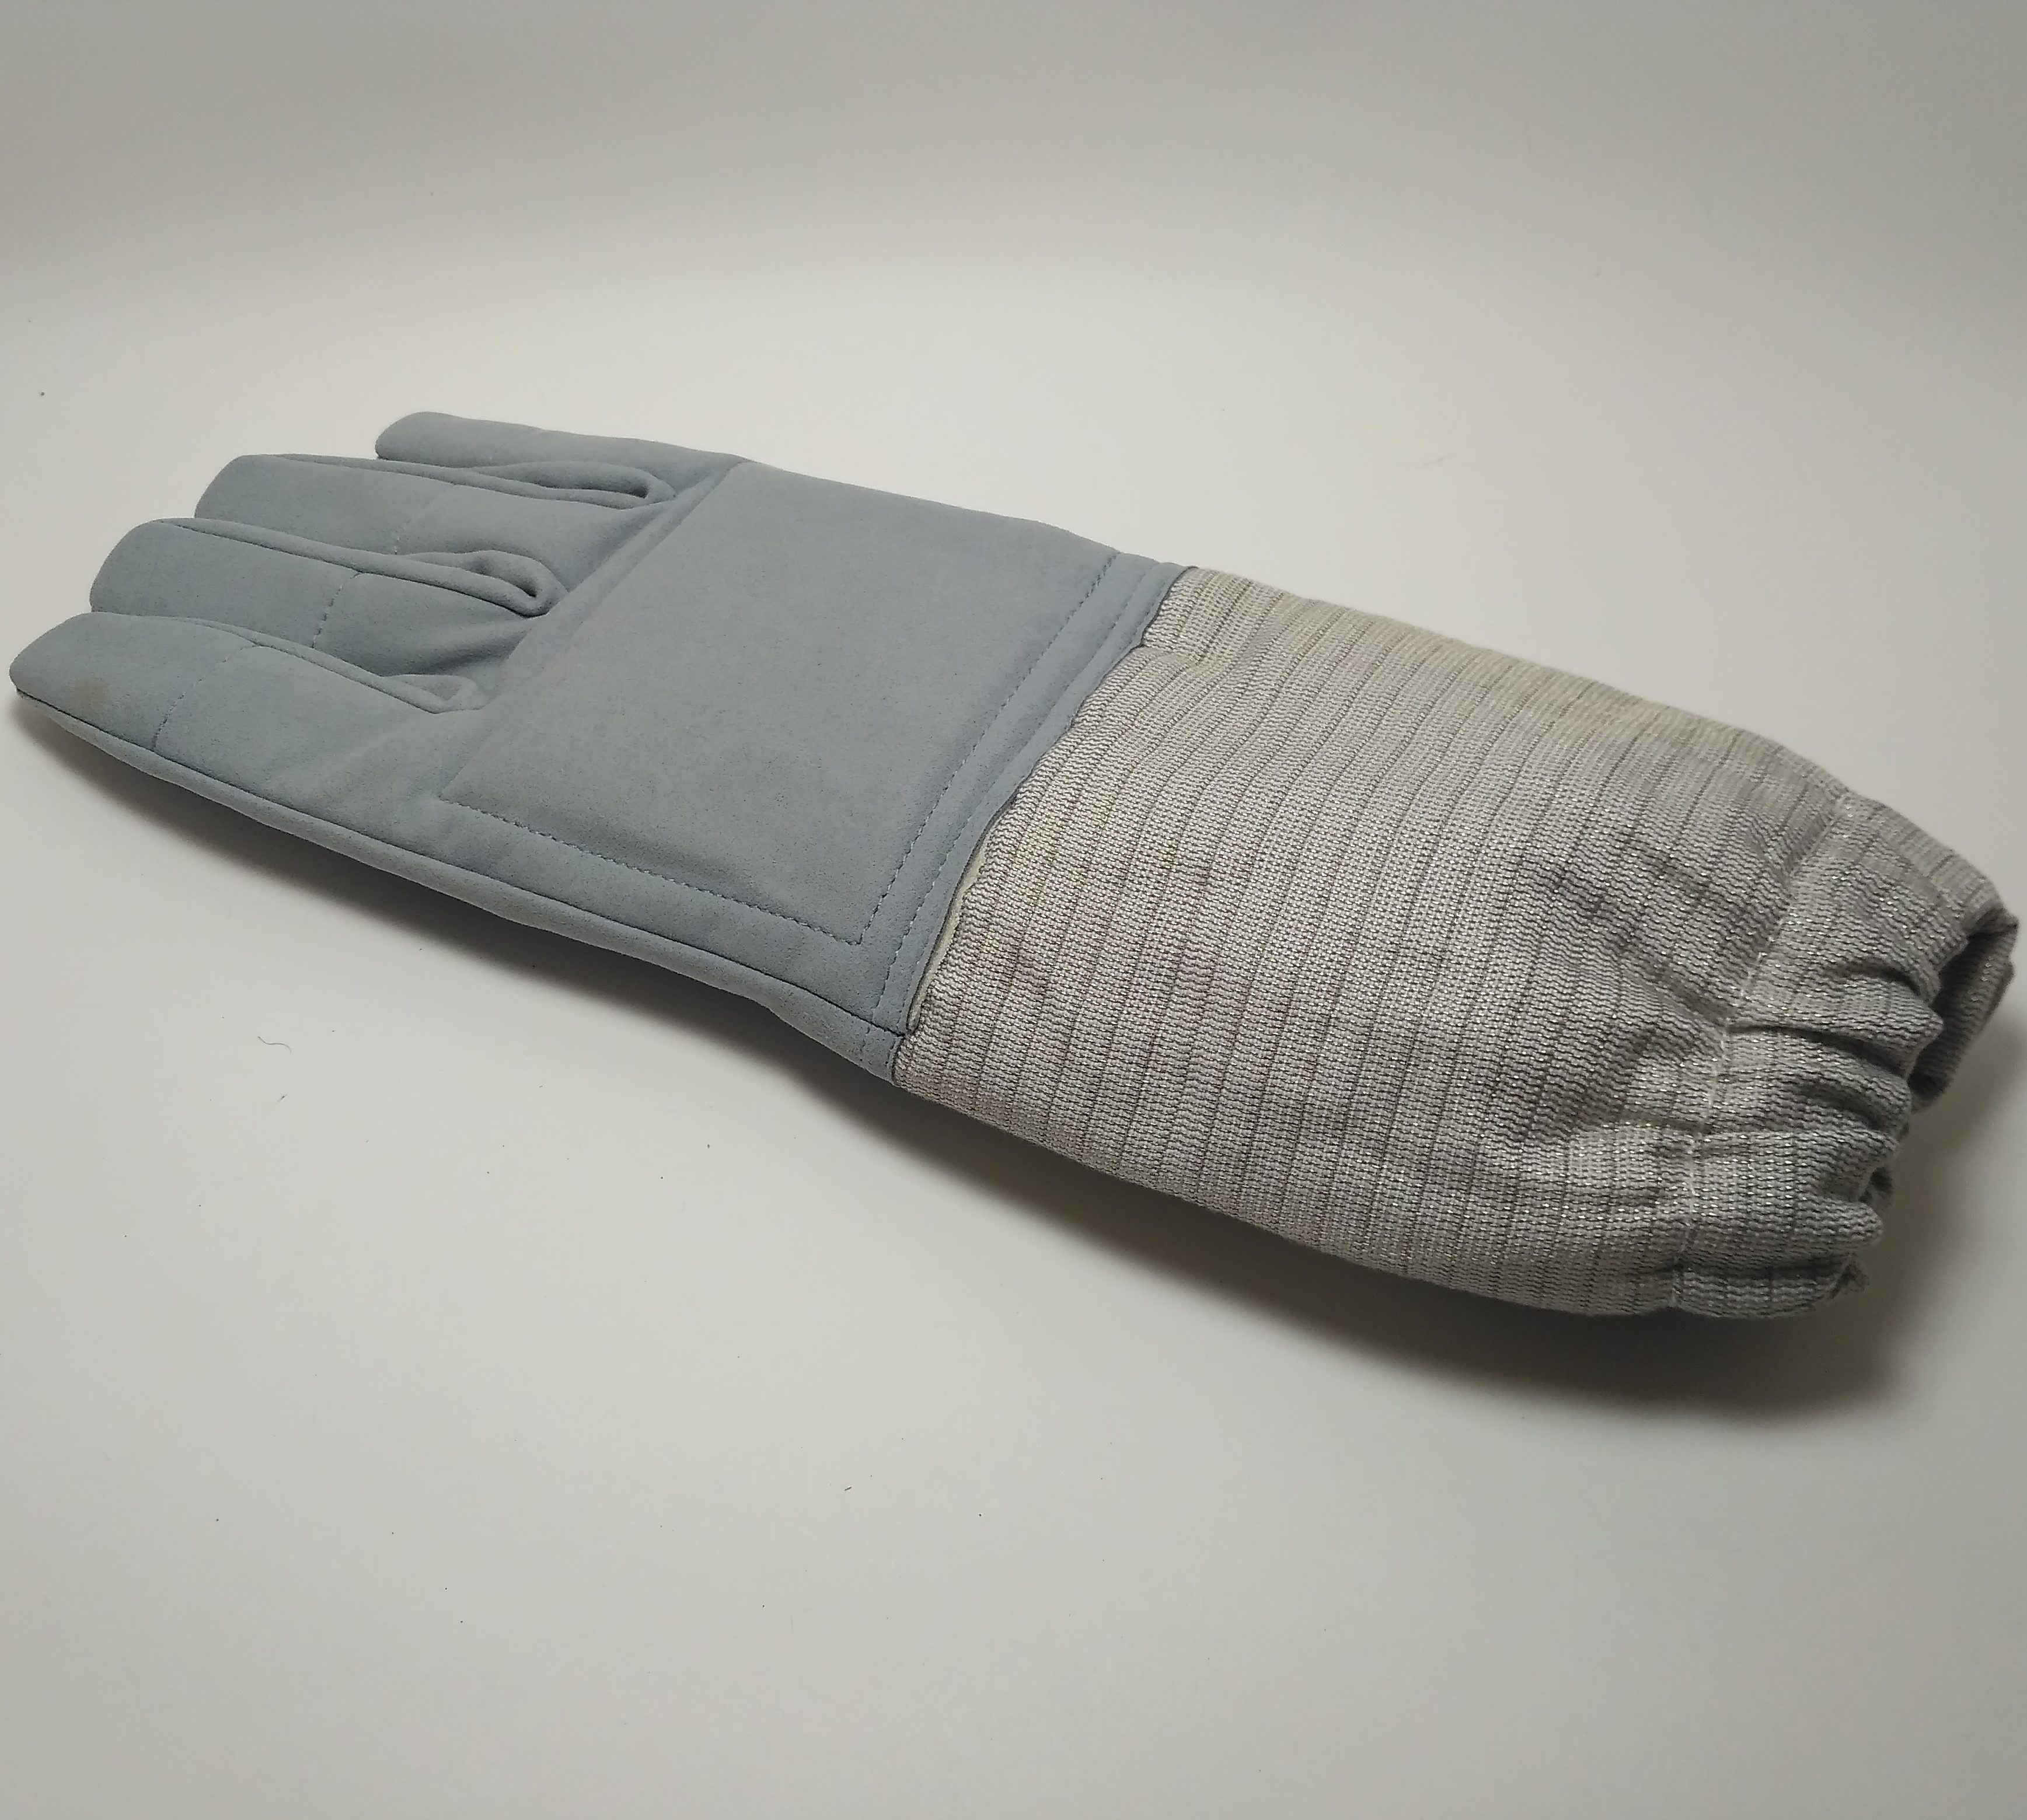 Перчатка сабля кожанная с электроманжетом_ Beyond-502(1)